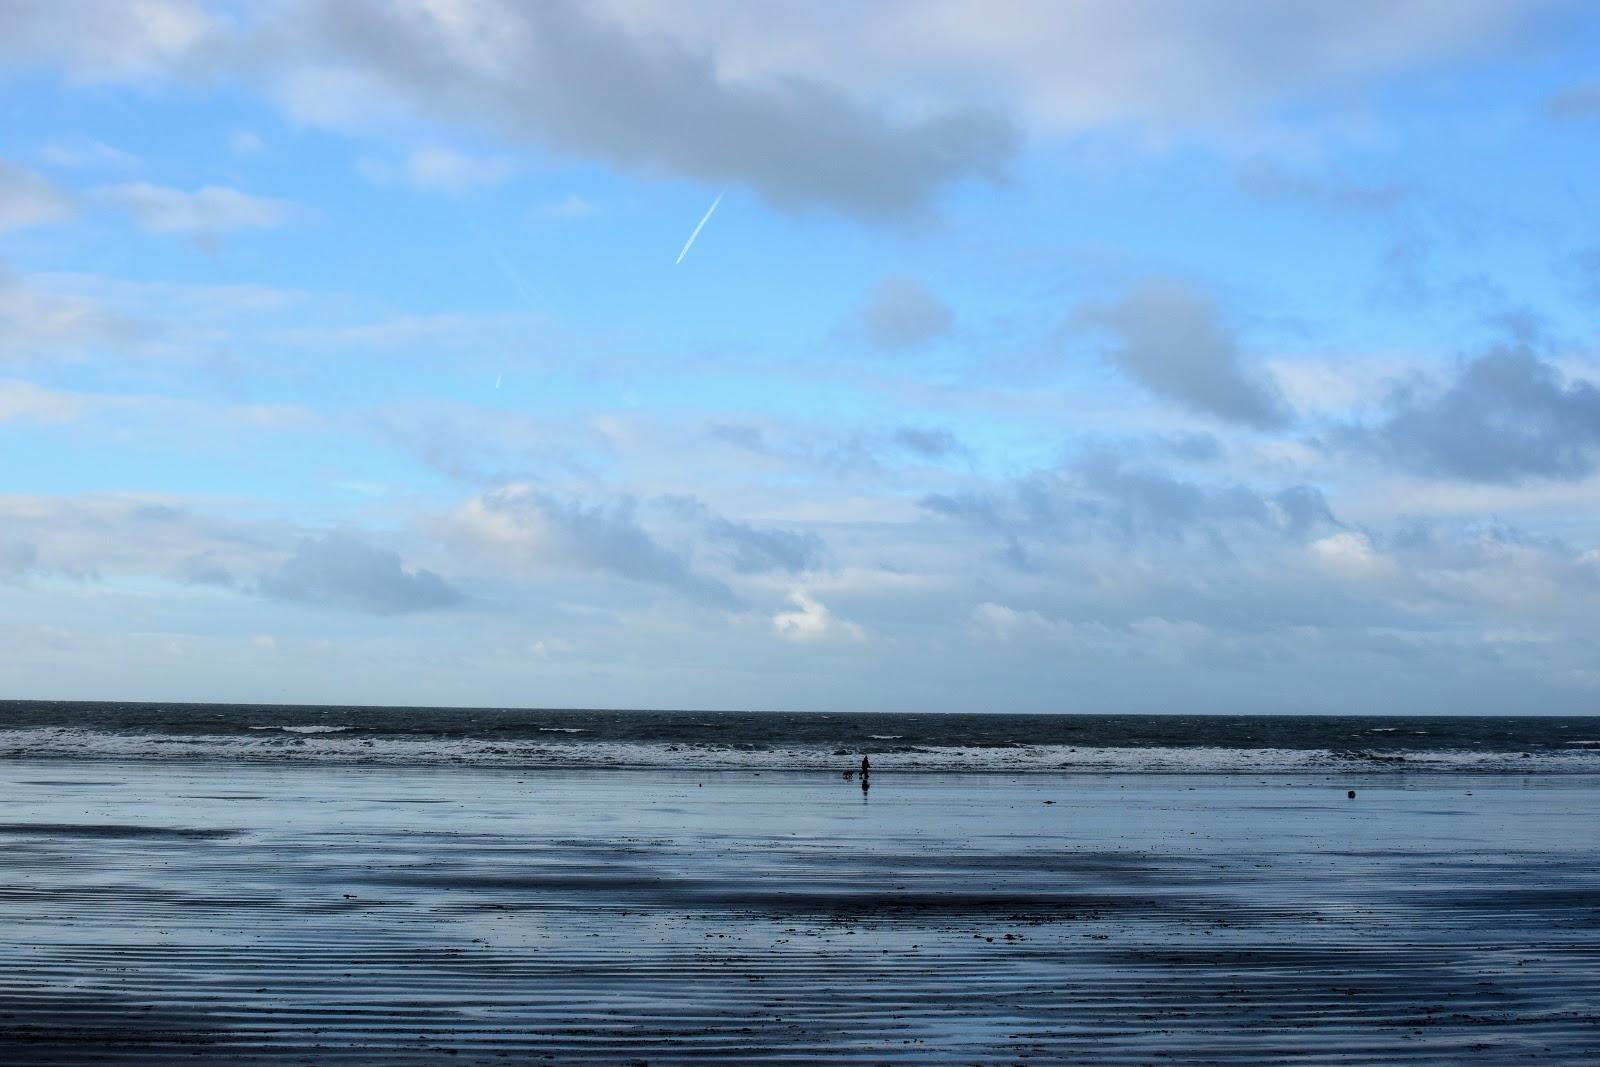 Newport Sands, Beach, Bay, Coast, Pembrokeshire, Pembrokeshire Coast, days out, free days out, visit Pembrokeshire, travel, family adventure, family day out, adventure, outdoors, get outdoors, family travel, beautiful beach,